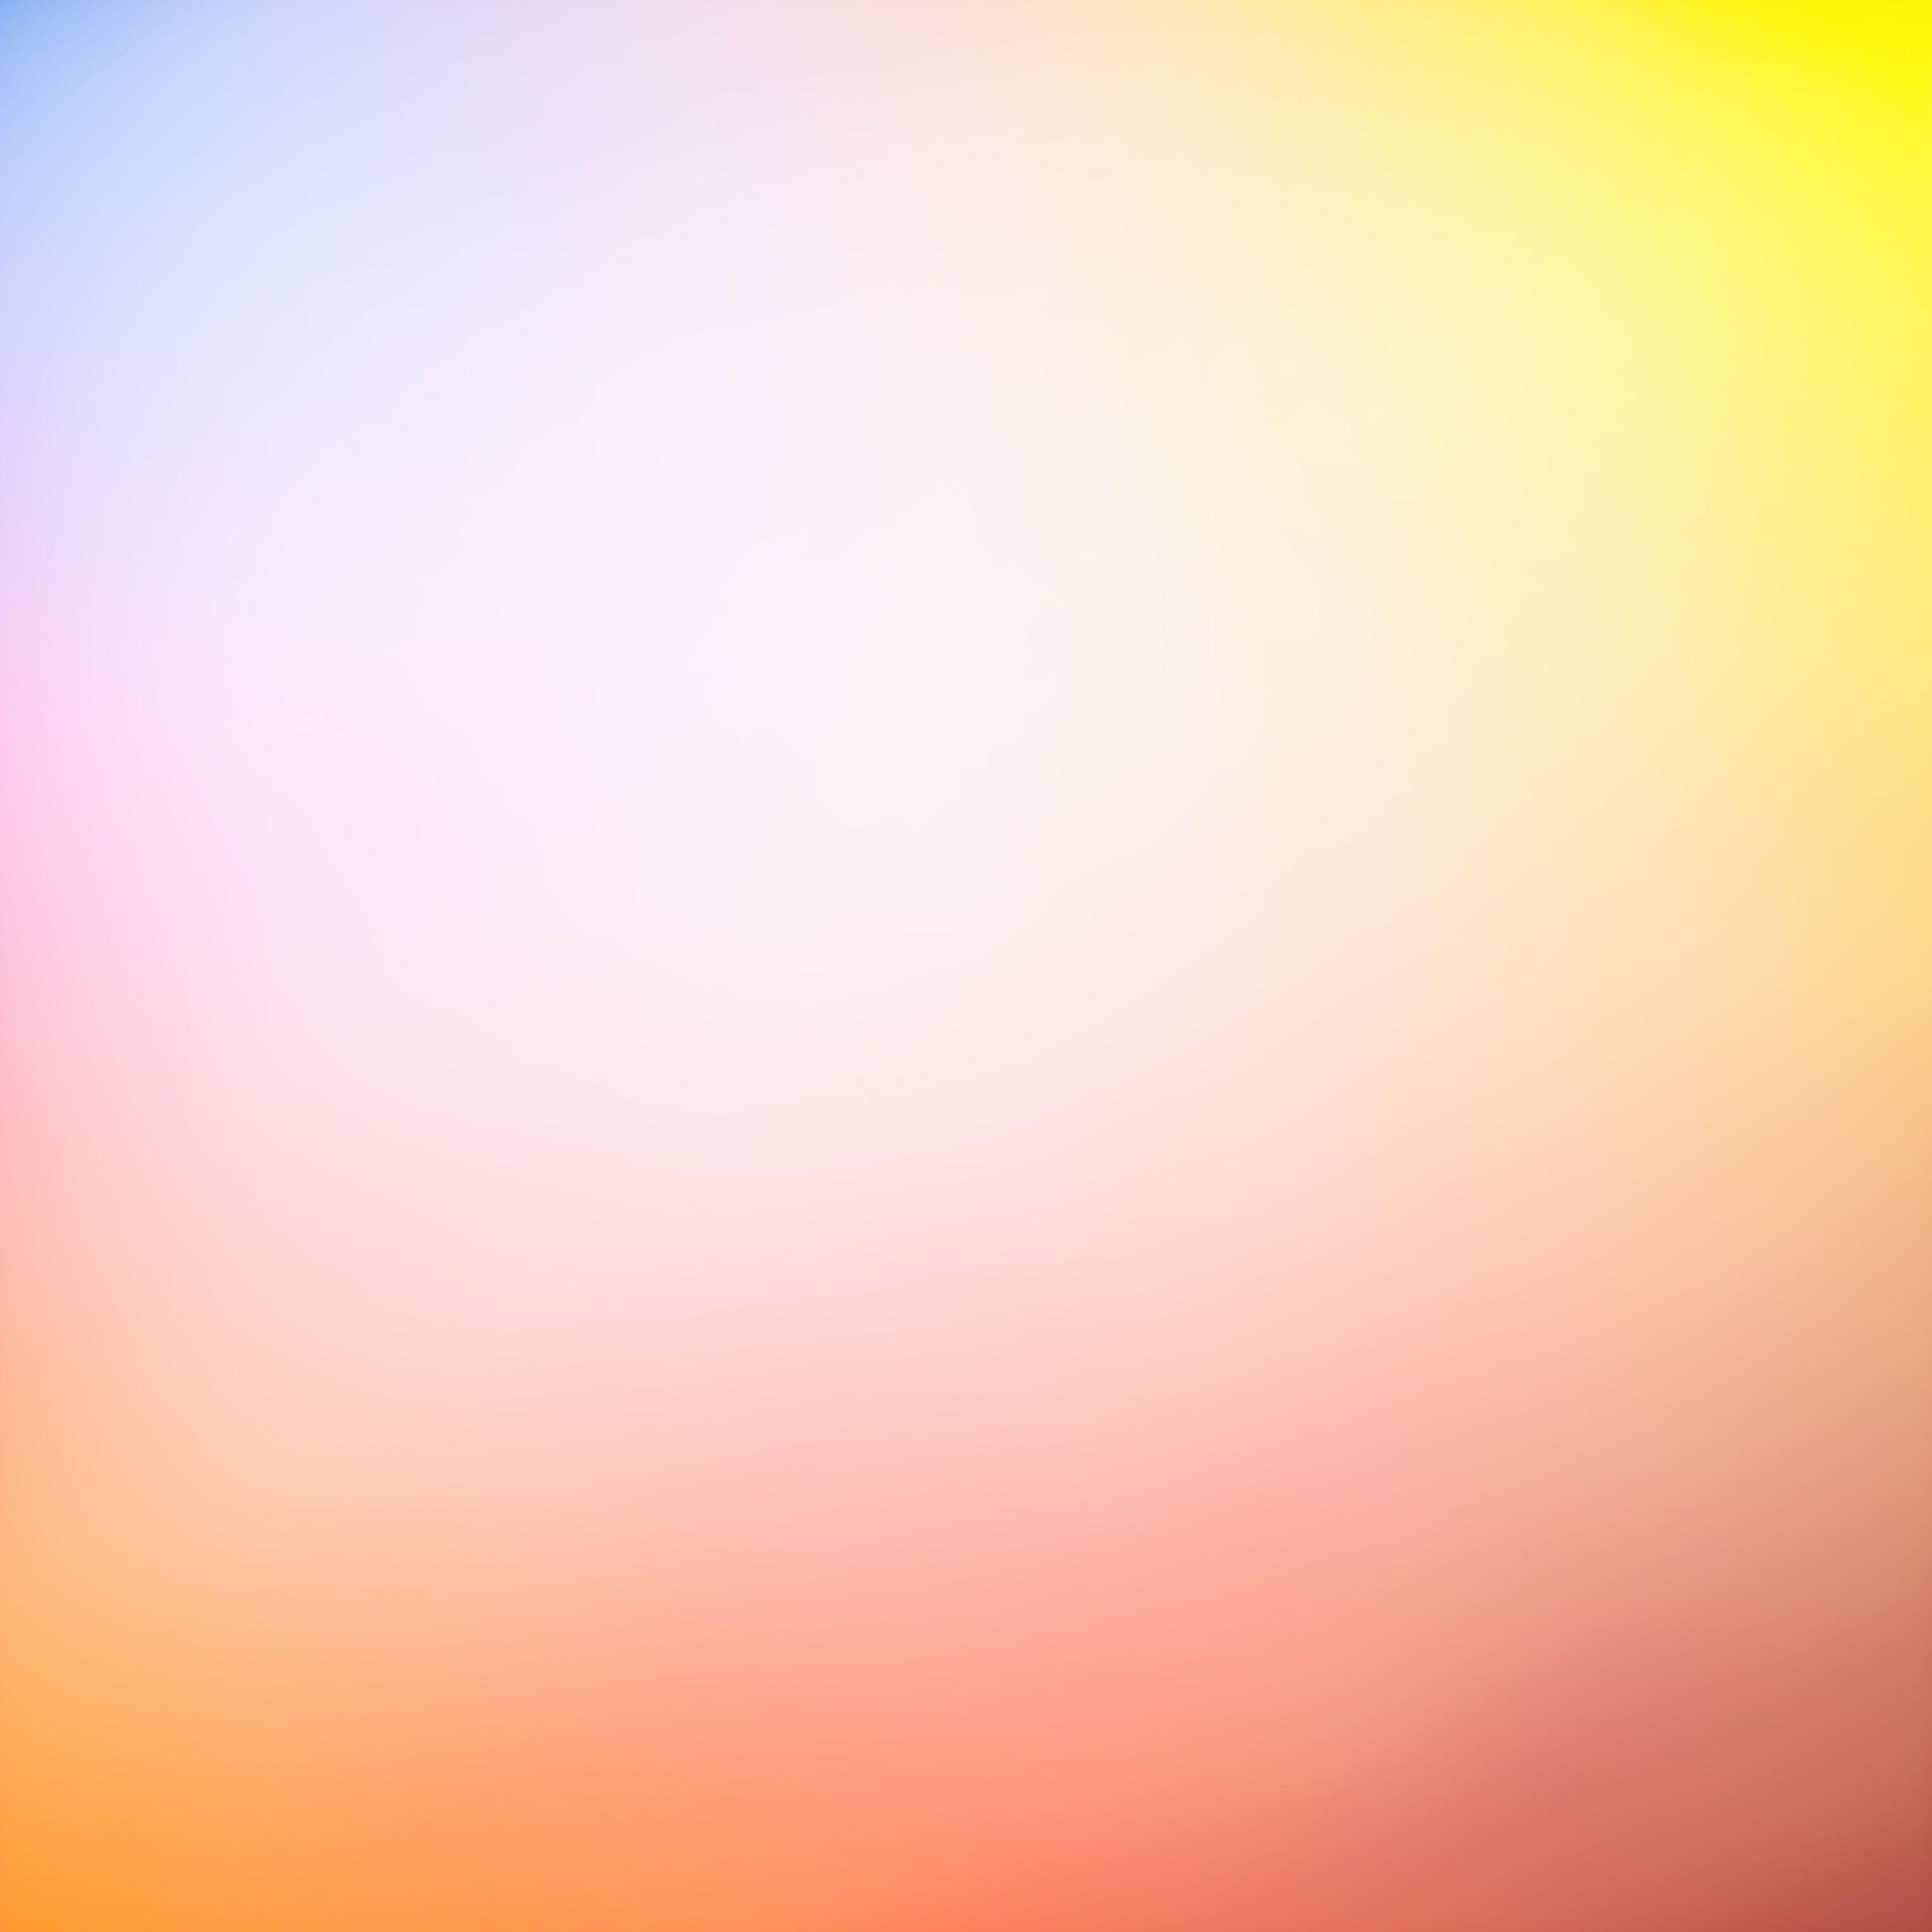 Simple Background (19) iPad Pro Wallpaper Sky color